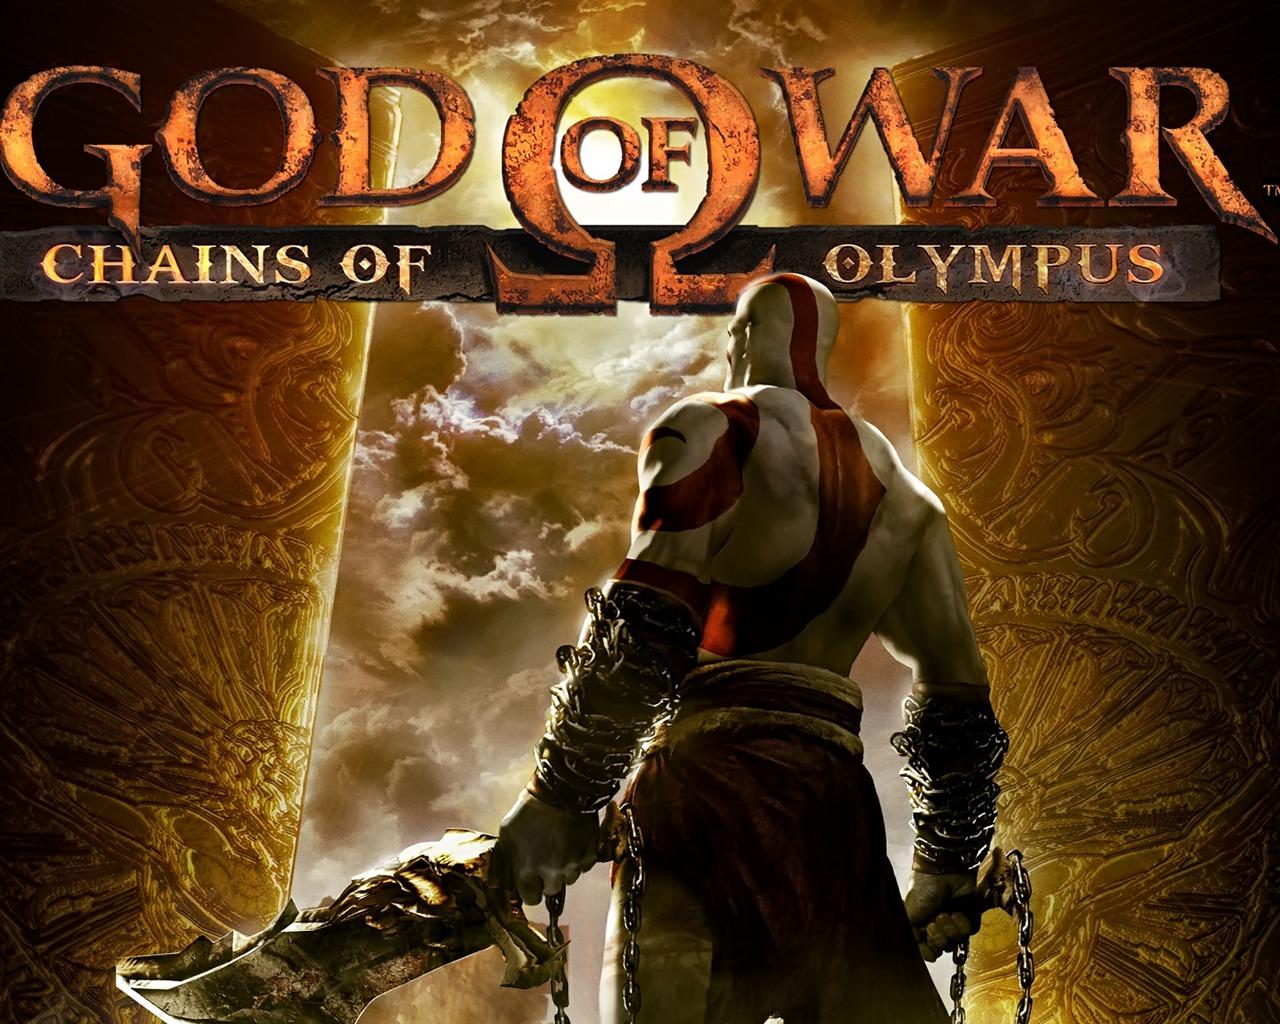 Gta Iv Wallpaper Girl God Of War Chains Of Olympus Wallpaper God Of War Games